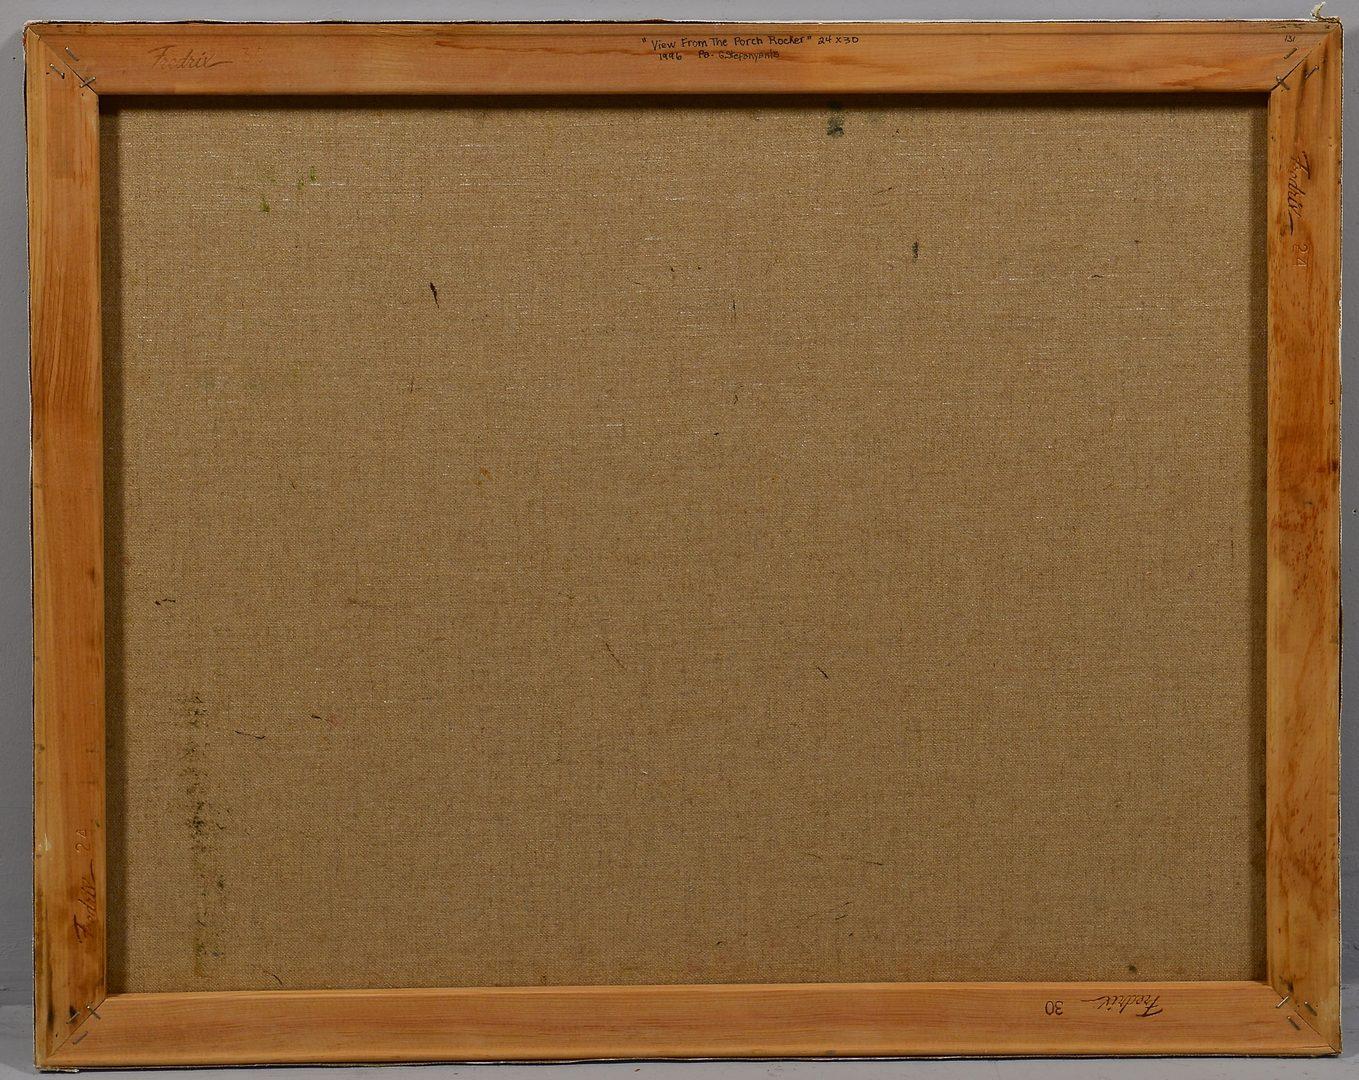 Lot 637: G. Stepanyants, oil on canvas, Landscape